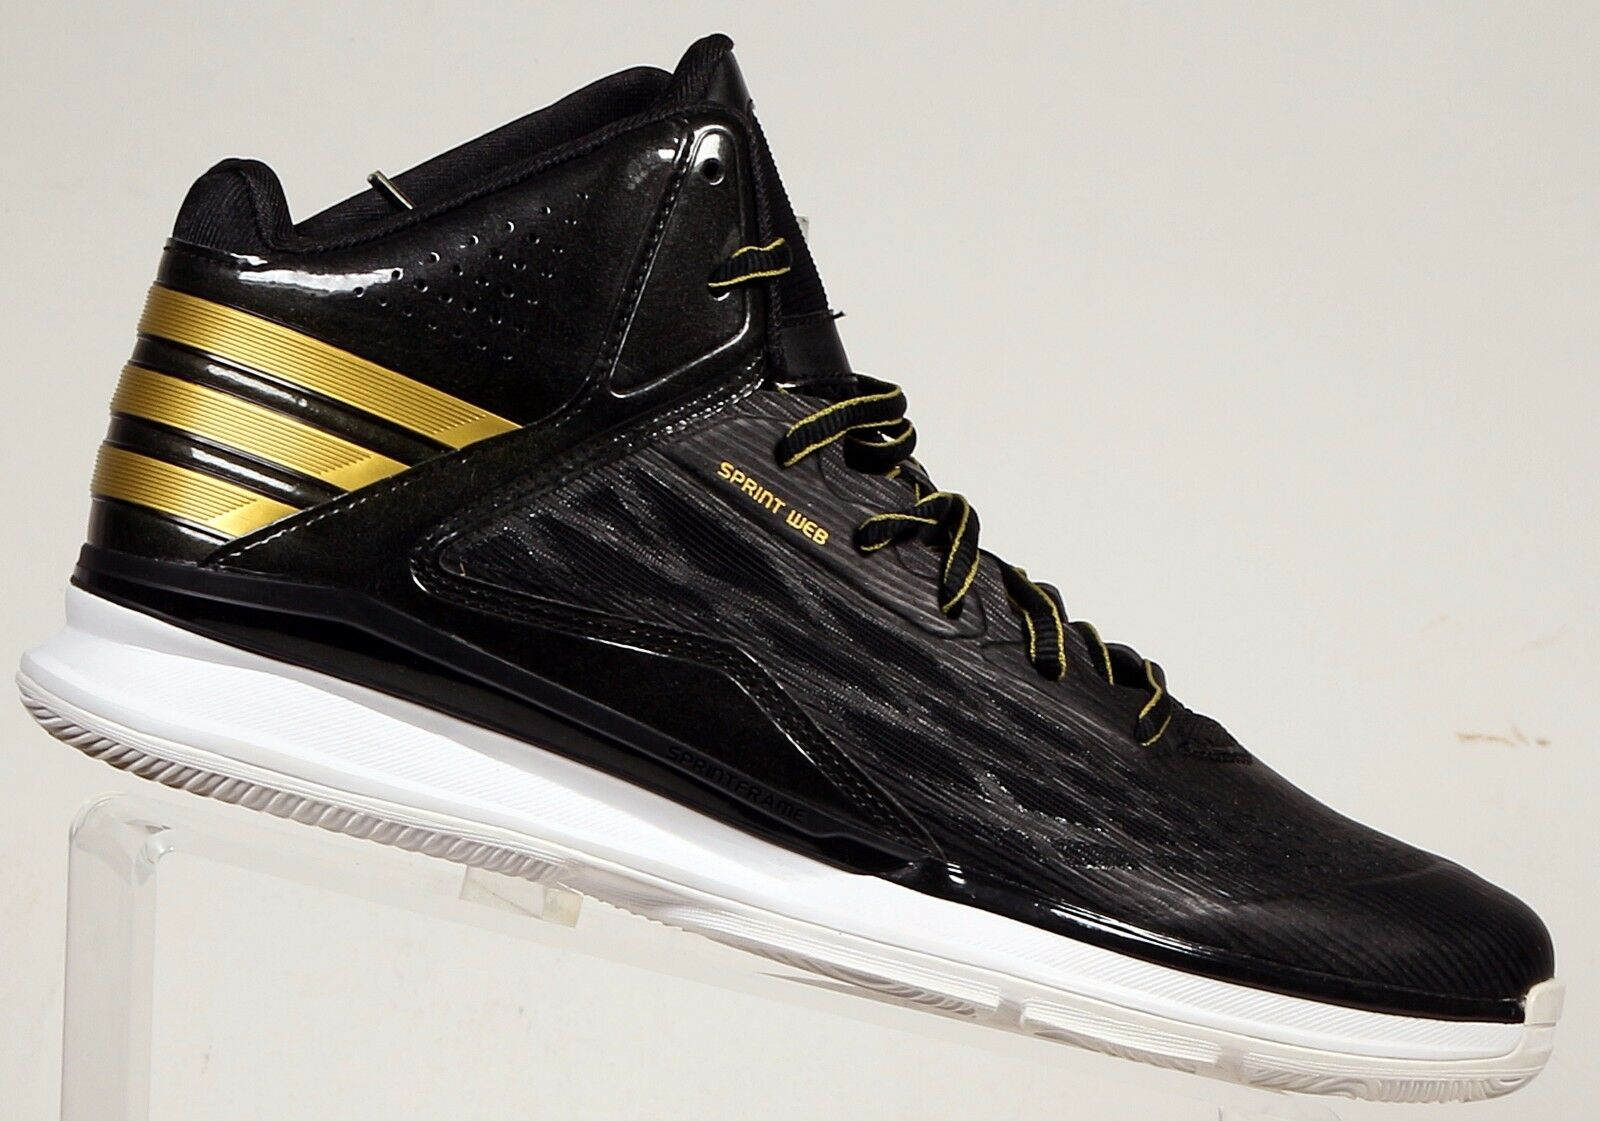 ADIDAS PERFORMANCE Men's Transcend Basketball Shoe Black gold Black TRAINING